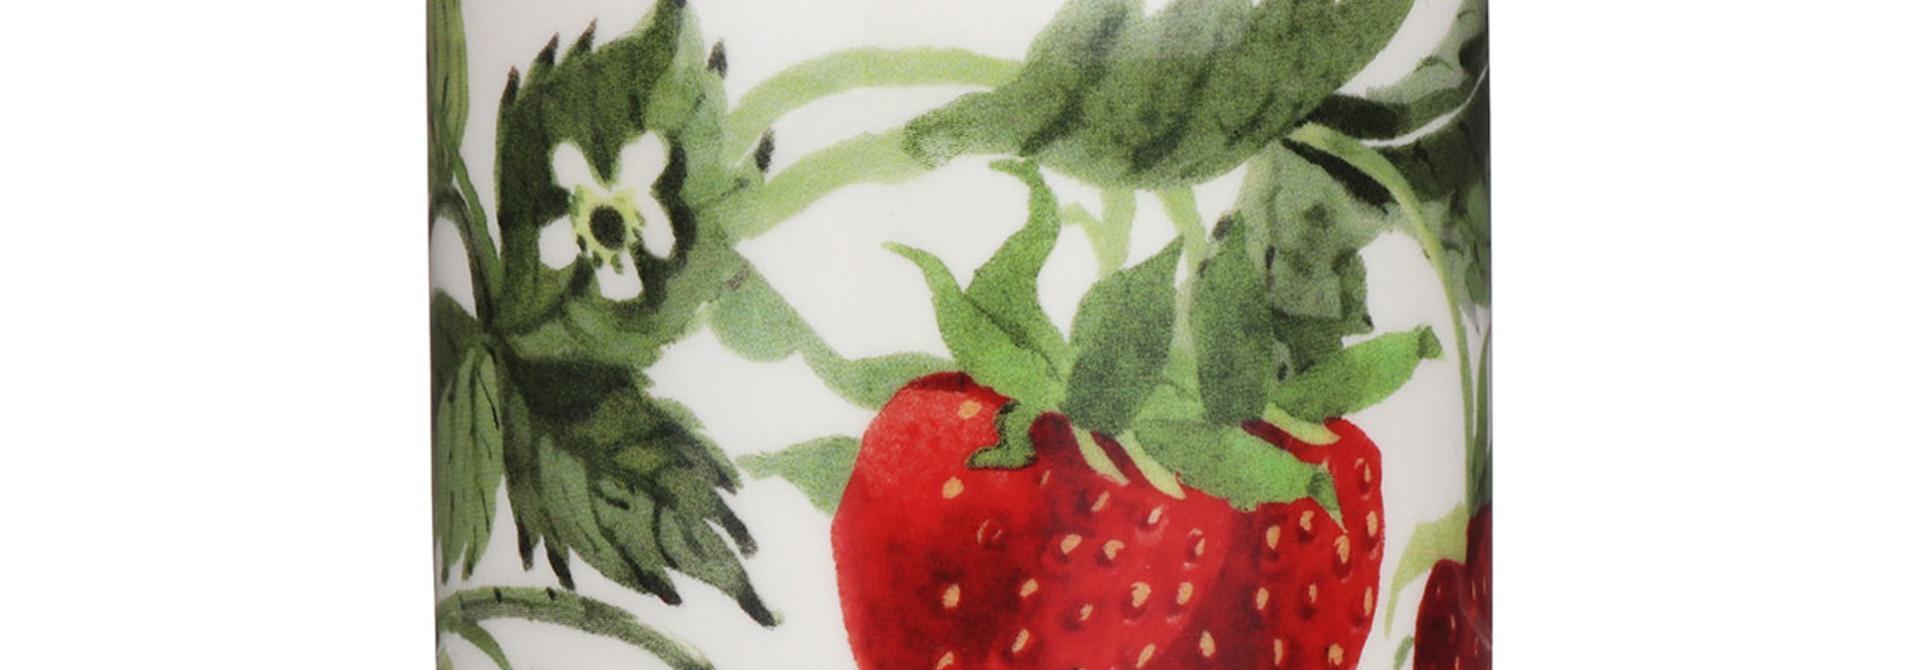 Jam Jar - Strawberries - w/Lid